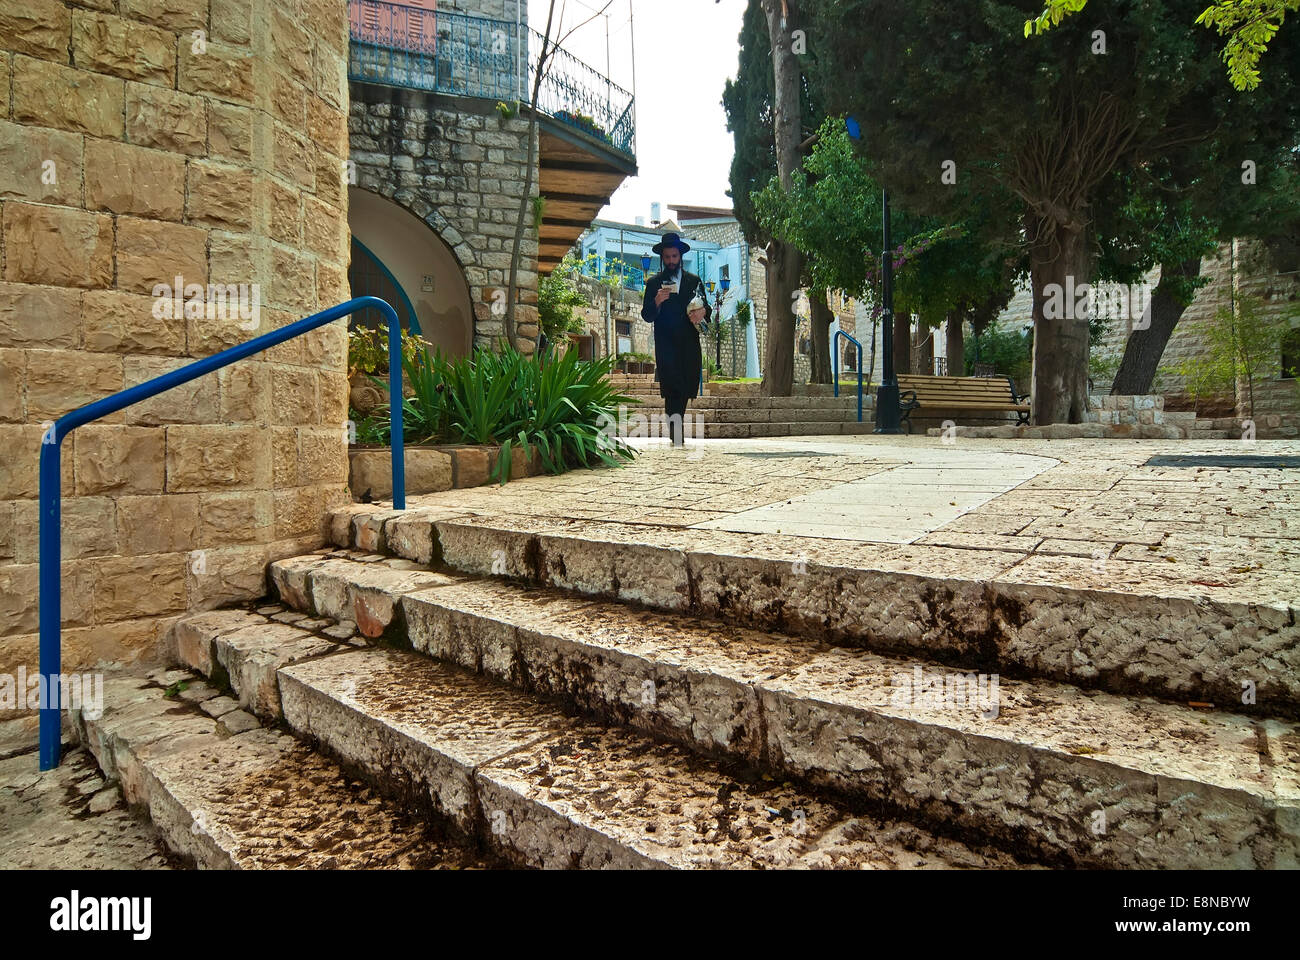 Hombre religioso en Safed, Israel Imagen De Stock